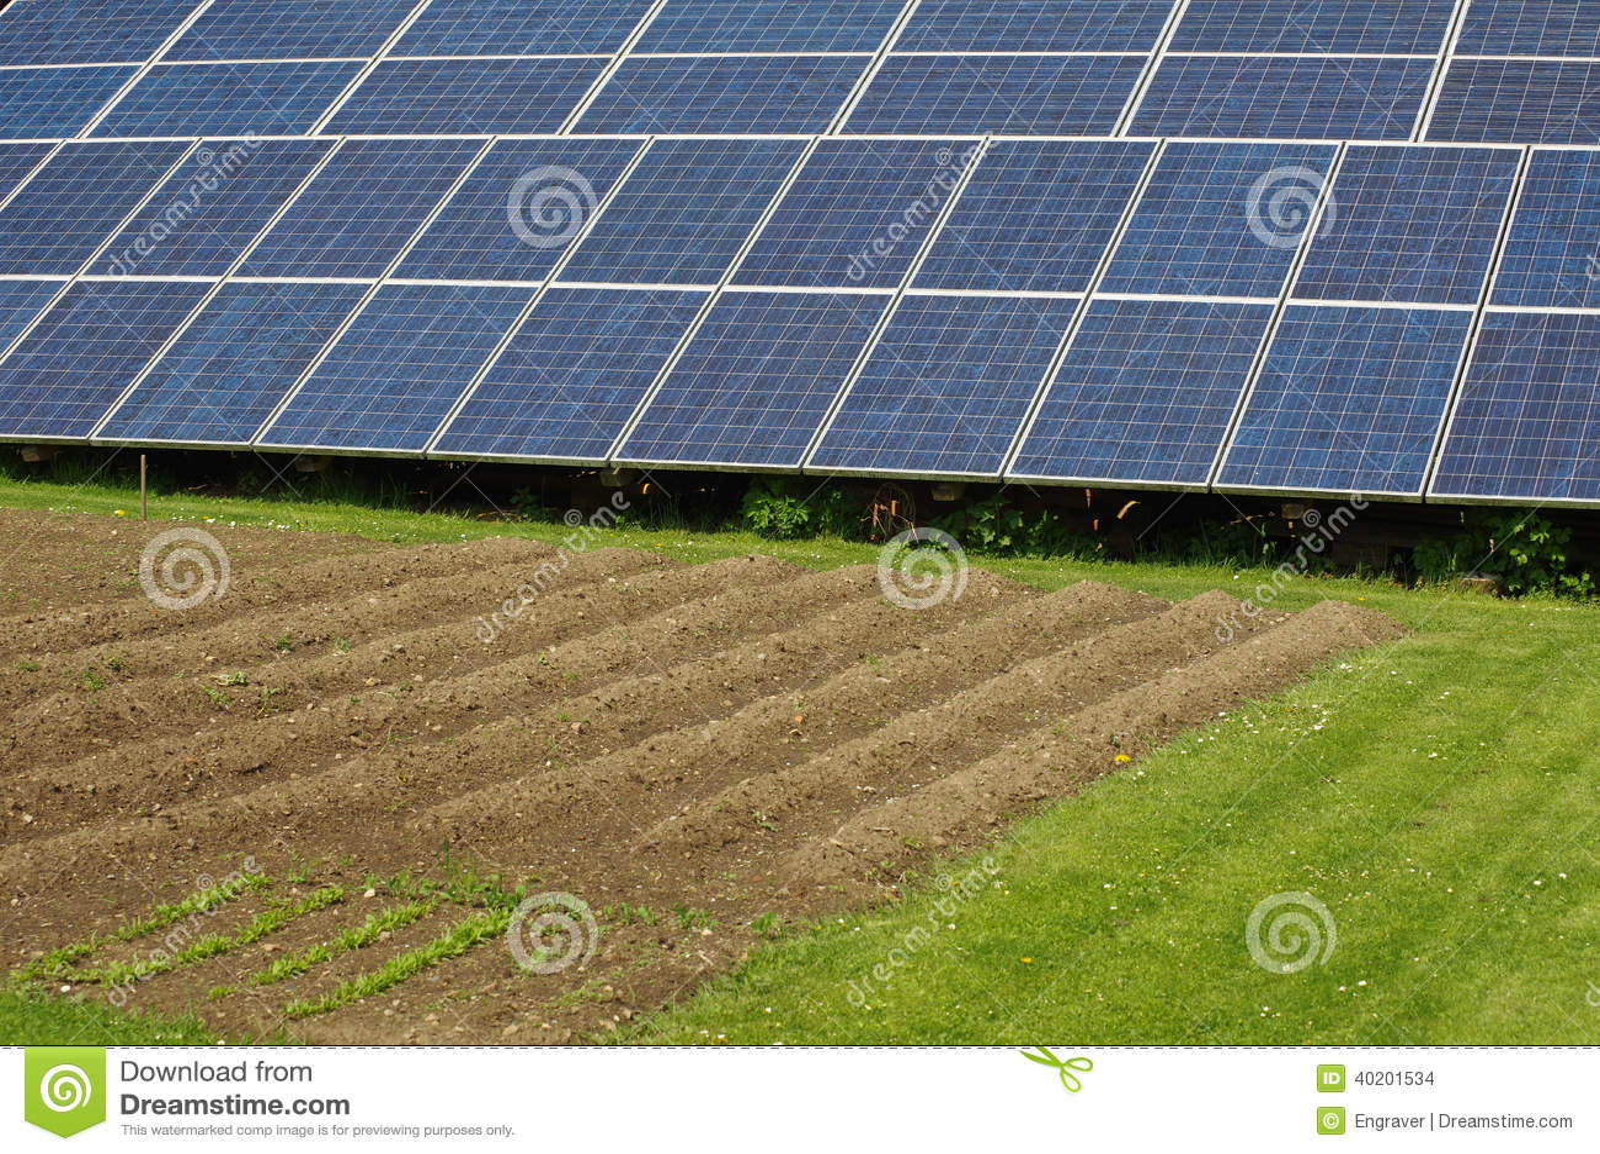 solar panels in the garden 3 stock photo image 40201534